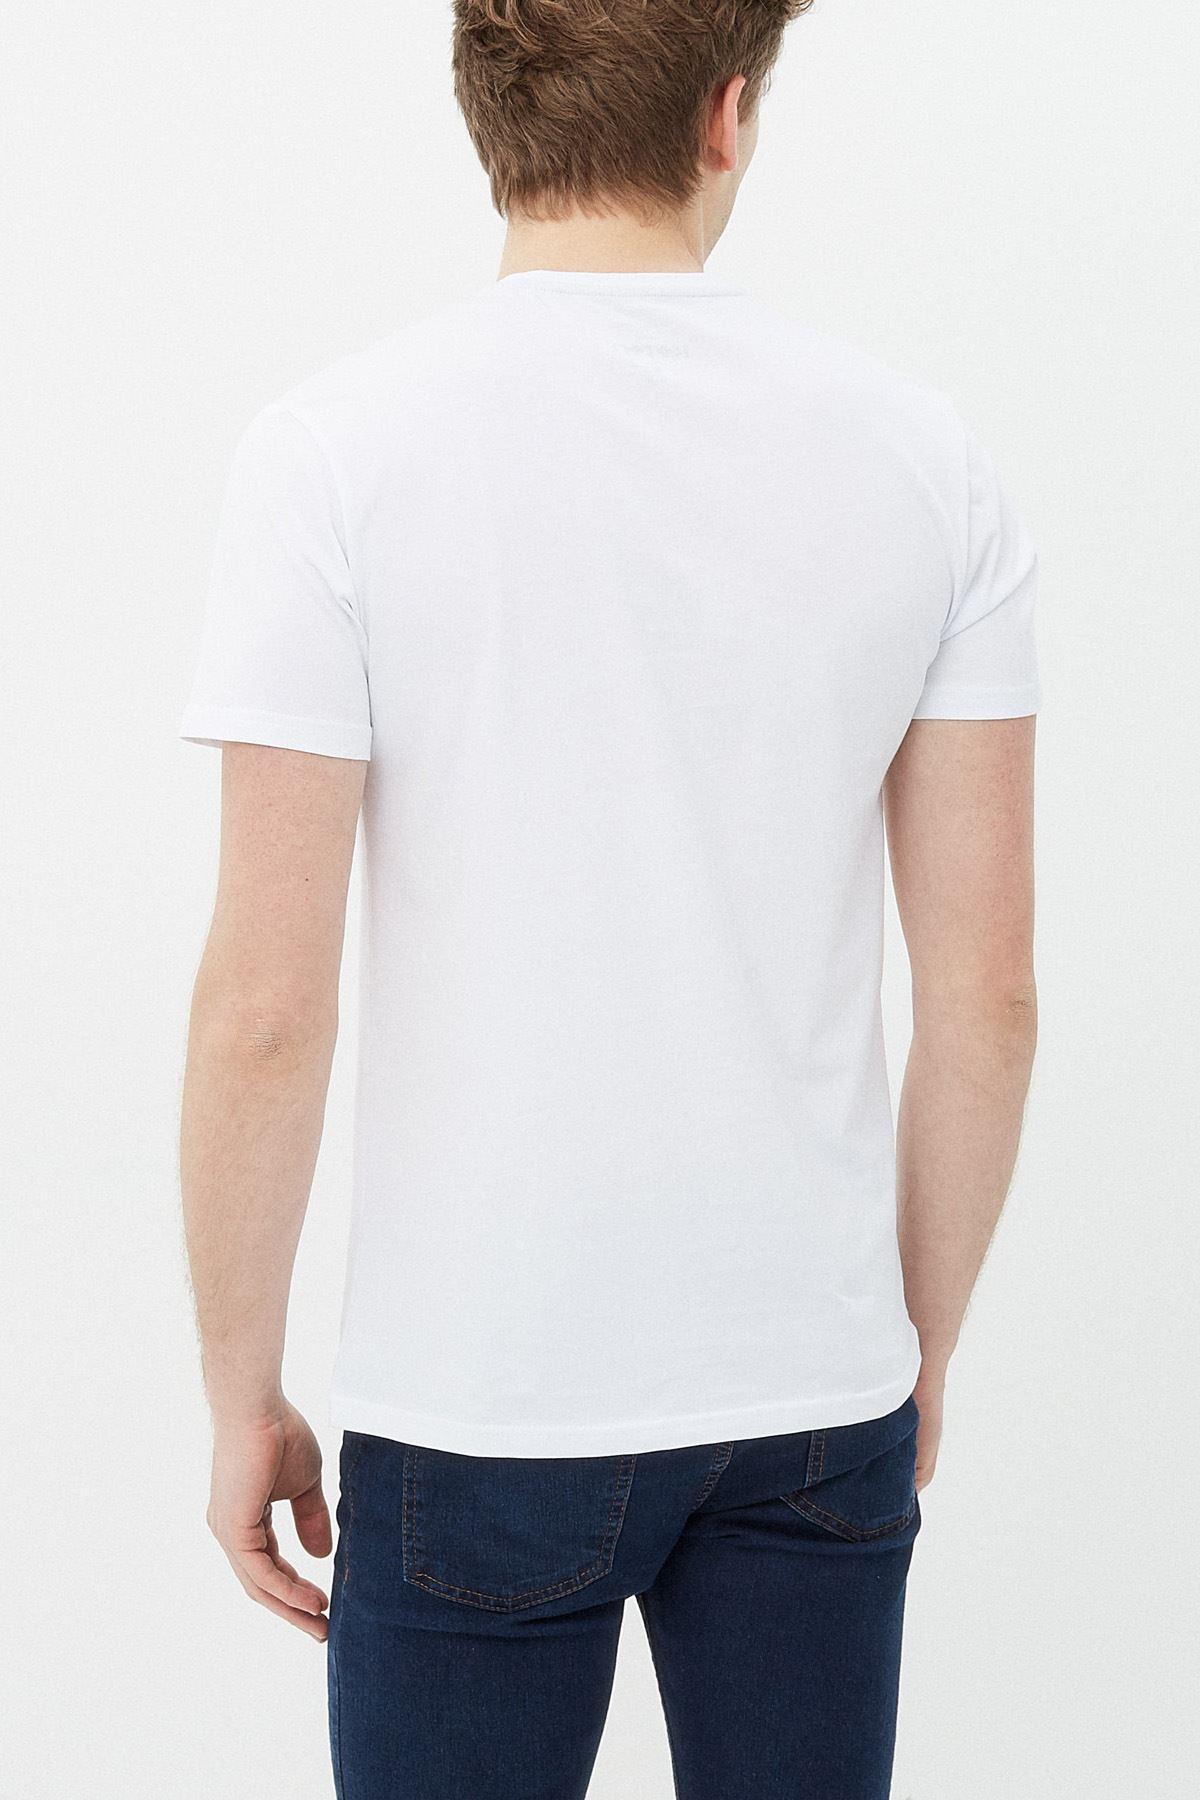 Anime Death Note 07 Beyaz Erkek Tshirt - Tişört